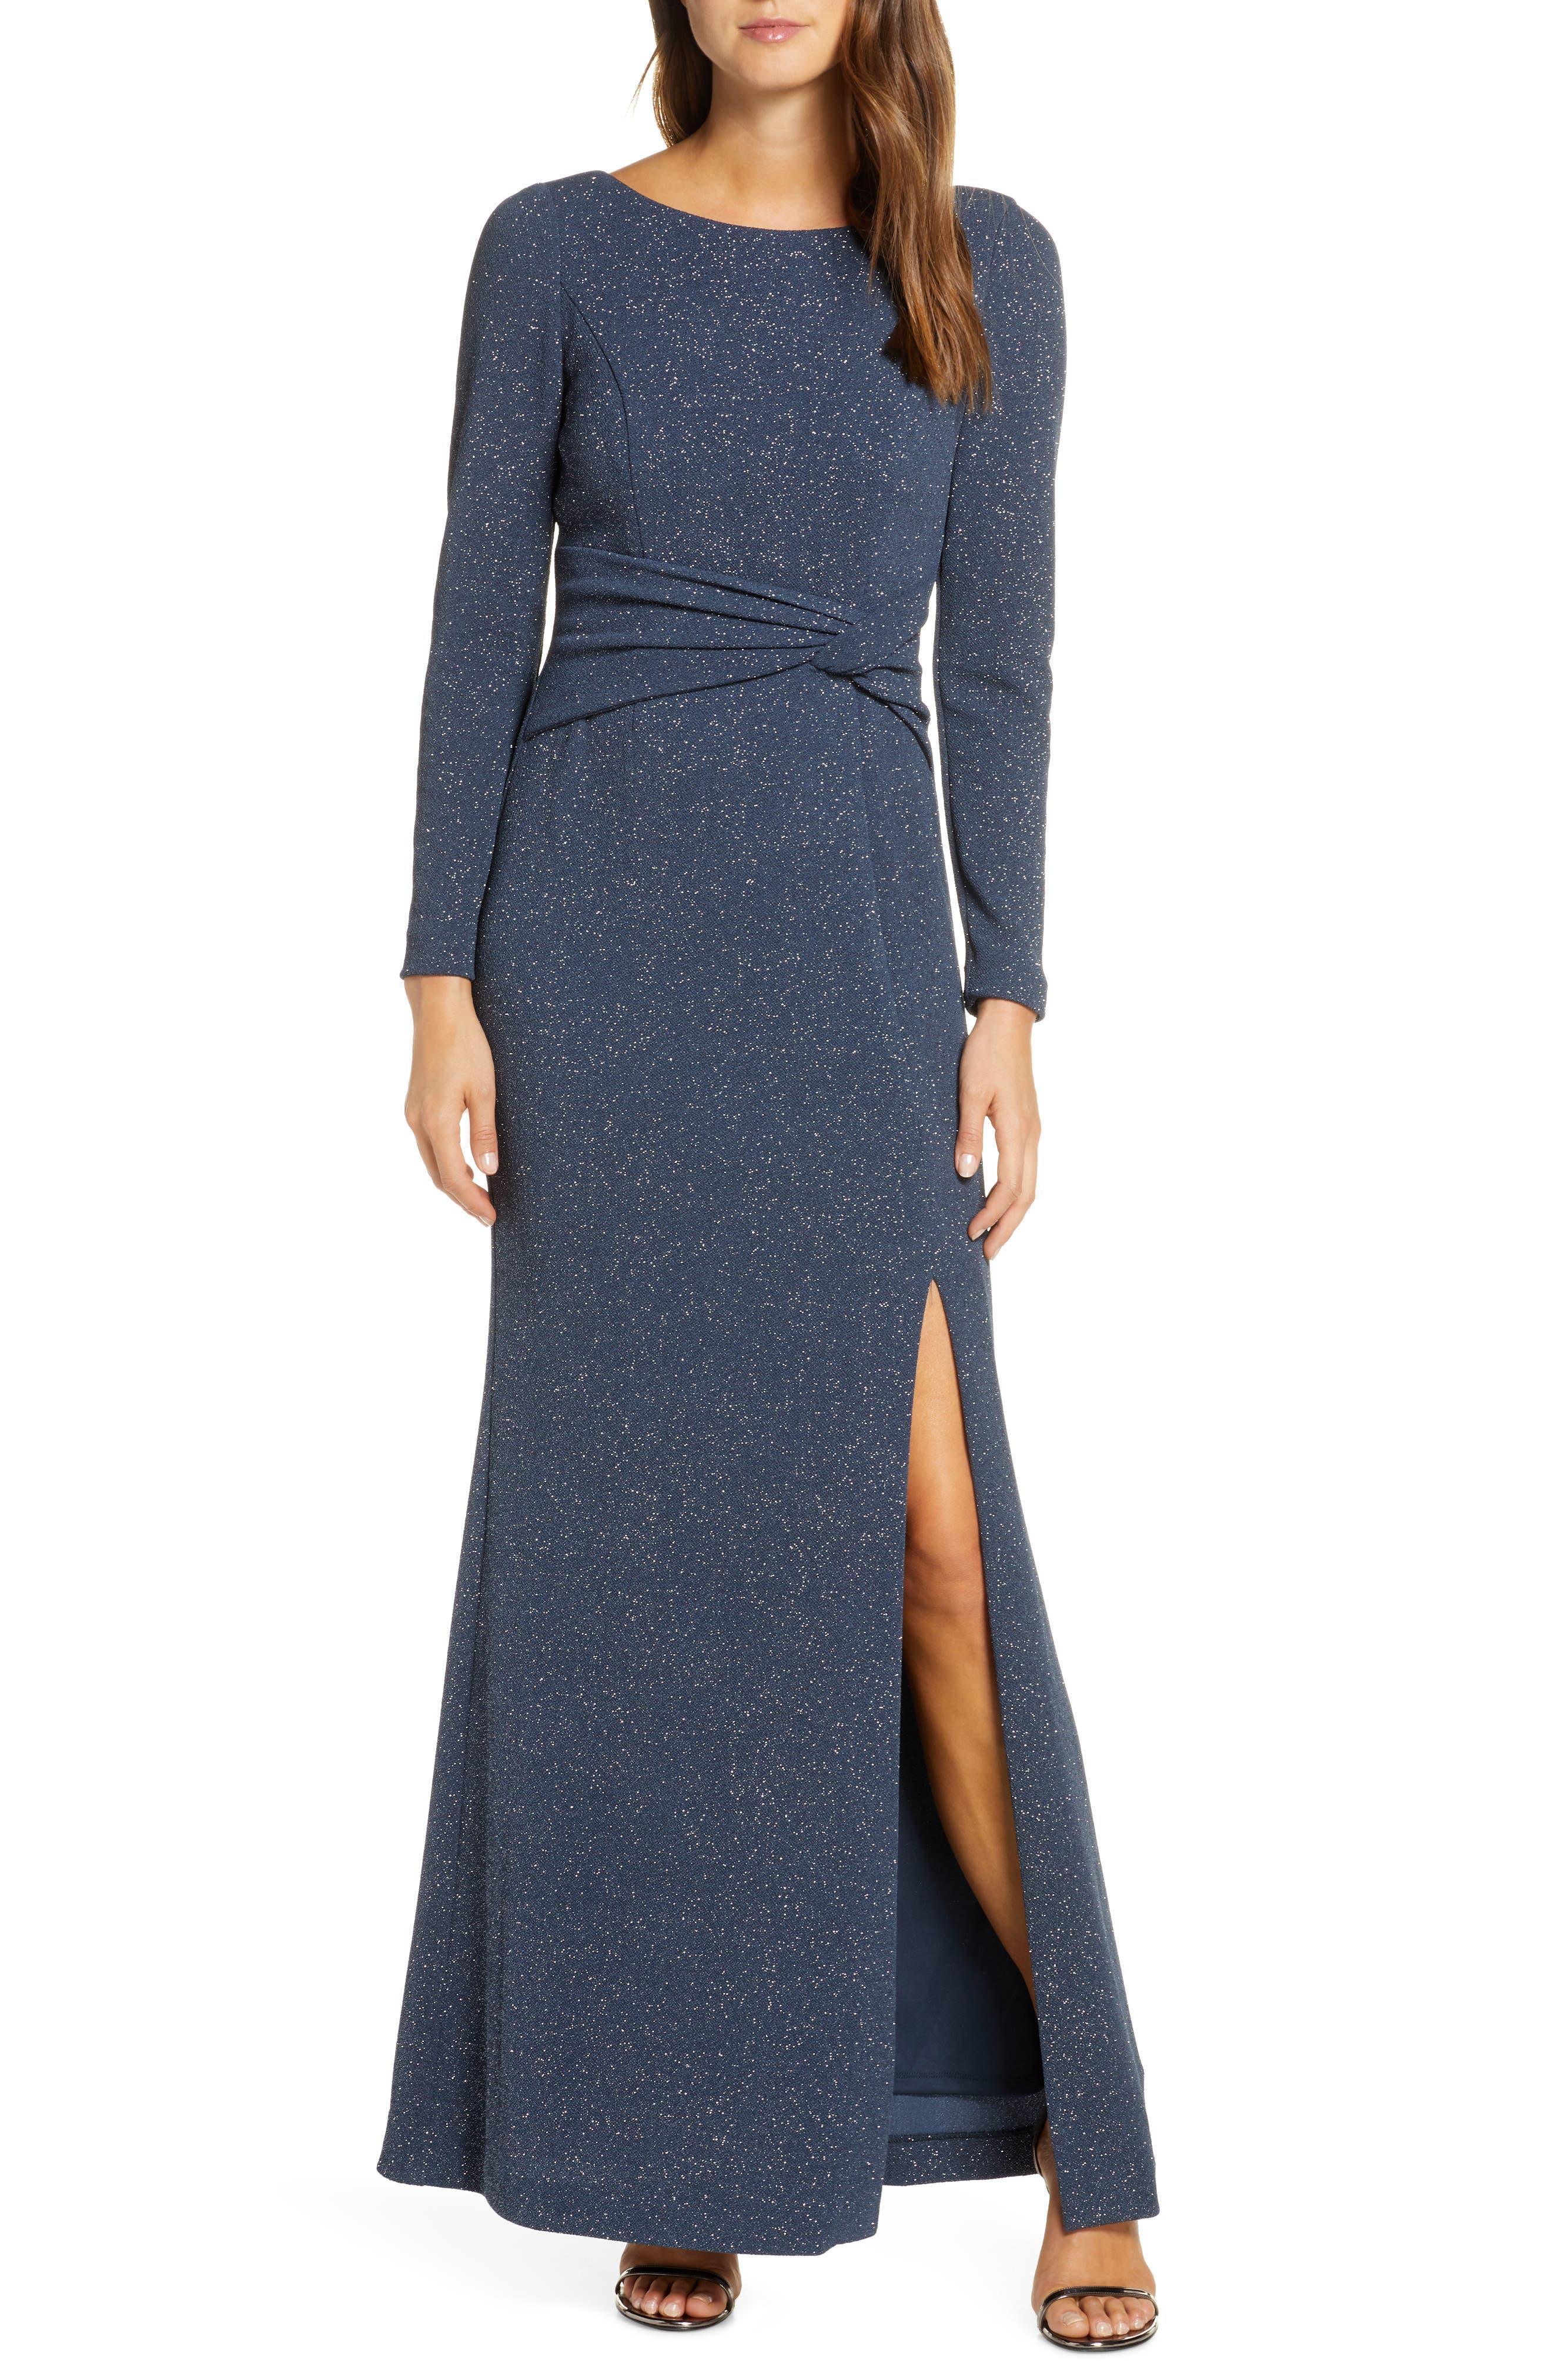 Petite Vince Camuto Bateau Neck Long Sleeve Sparkle Gown, Grey